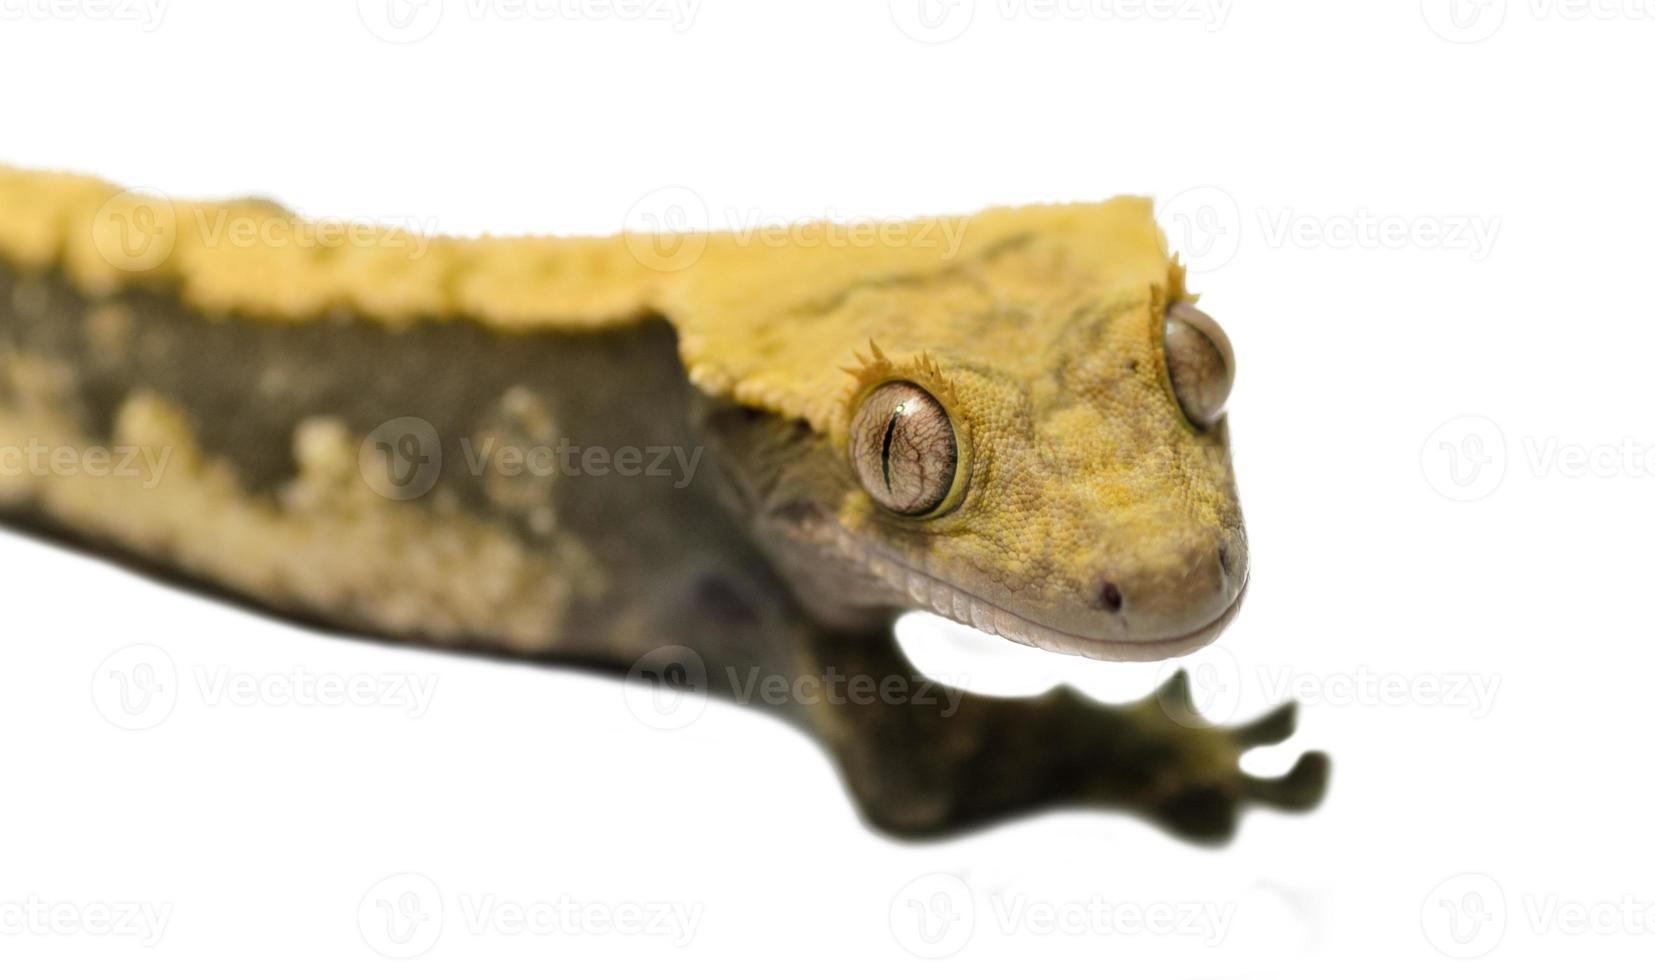 lagartixa com crista de lagarto isolada no fundo branco foto